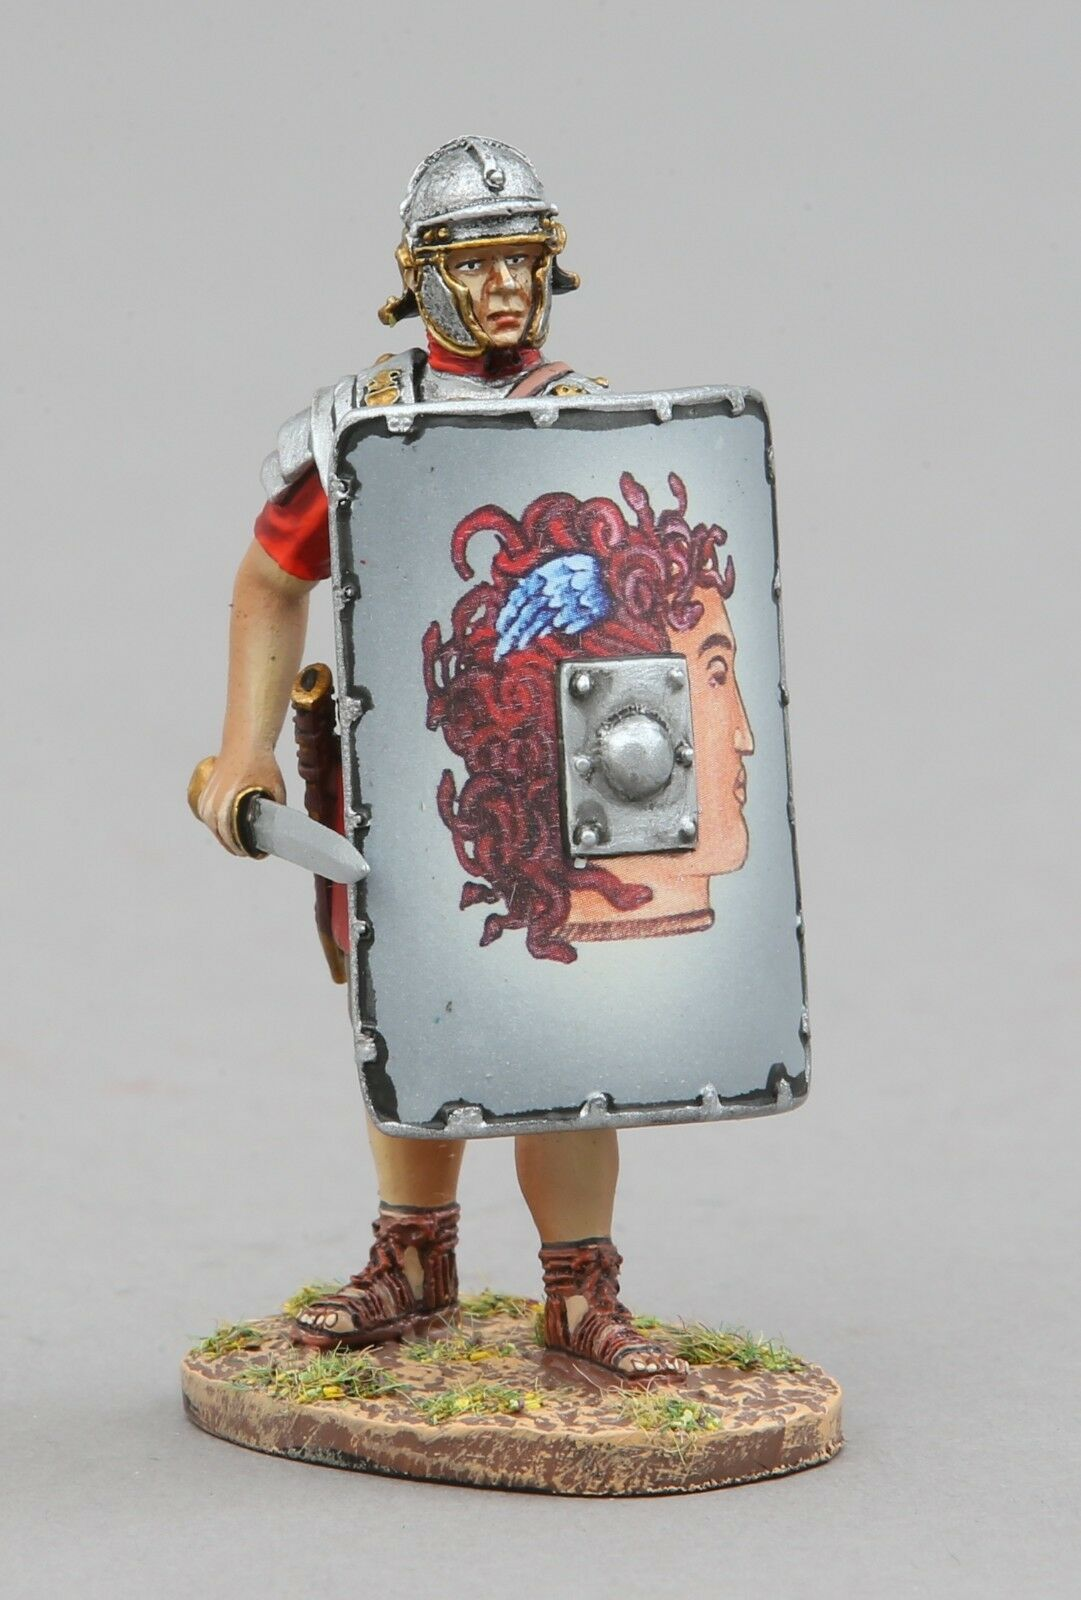 Thomas Gunn Rouomoa Impero ROM110D Minerva Legionario Scudo Muro MIB